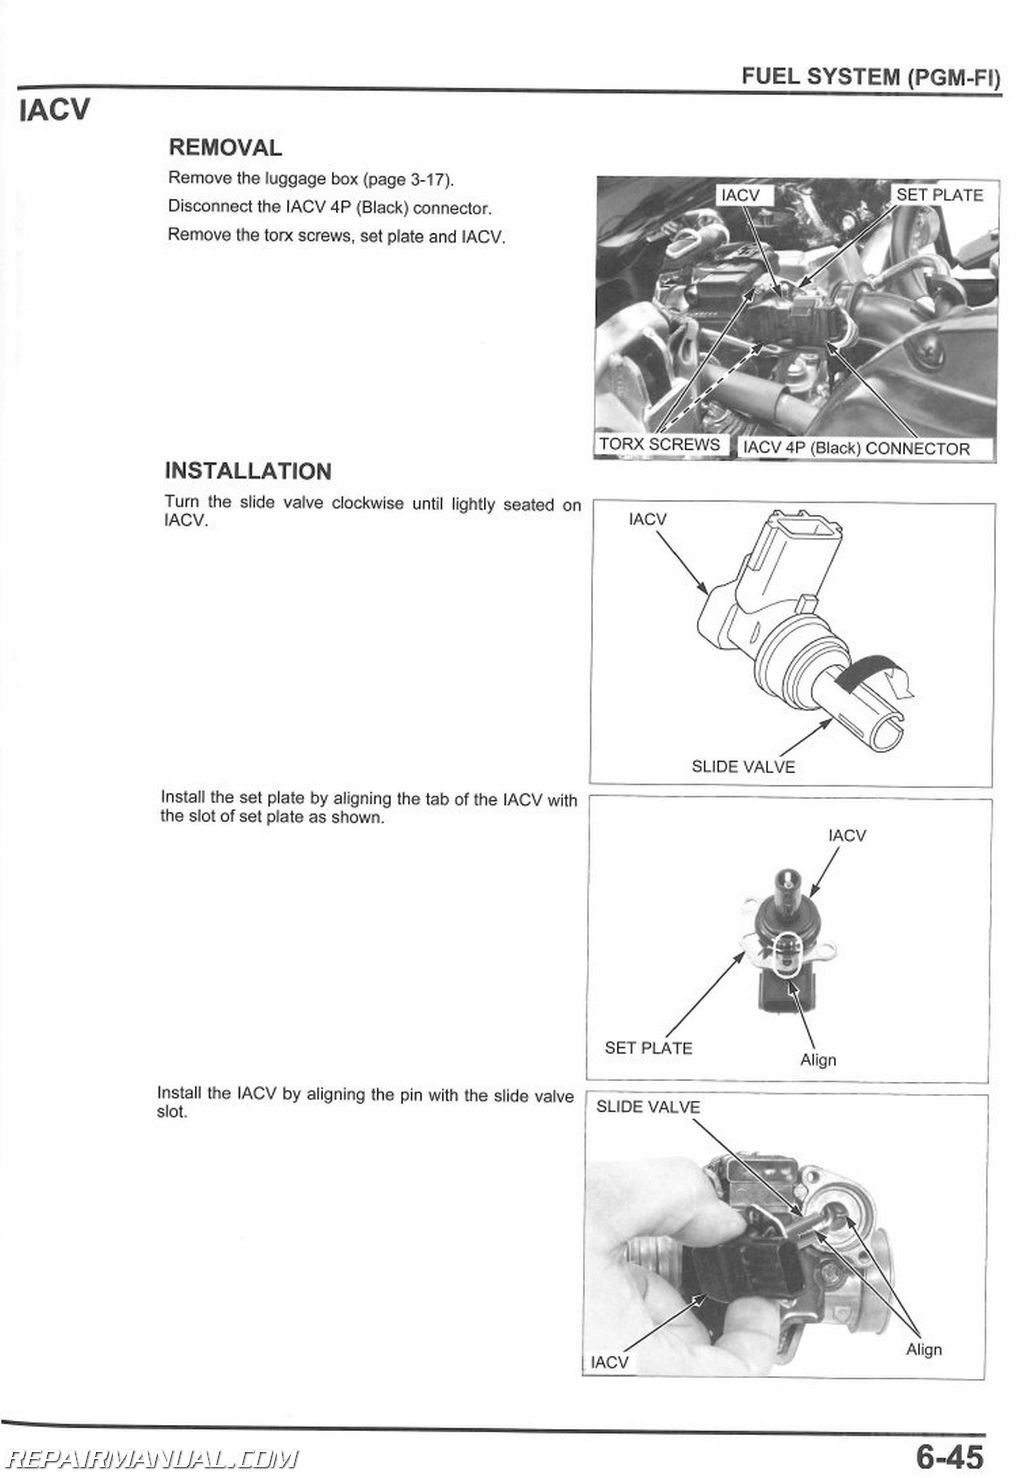 2011 Honda Pcx125 Scooter Service Manual